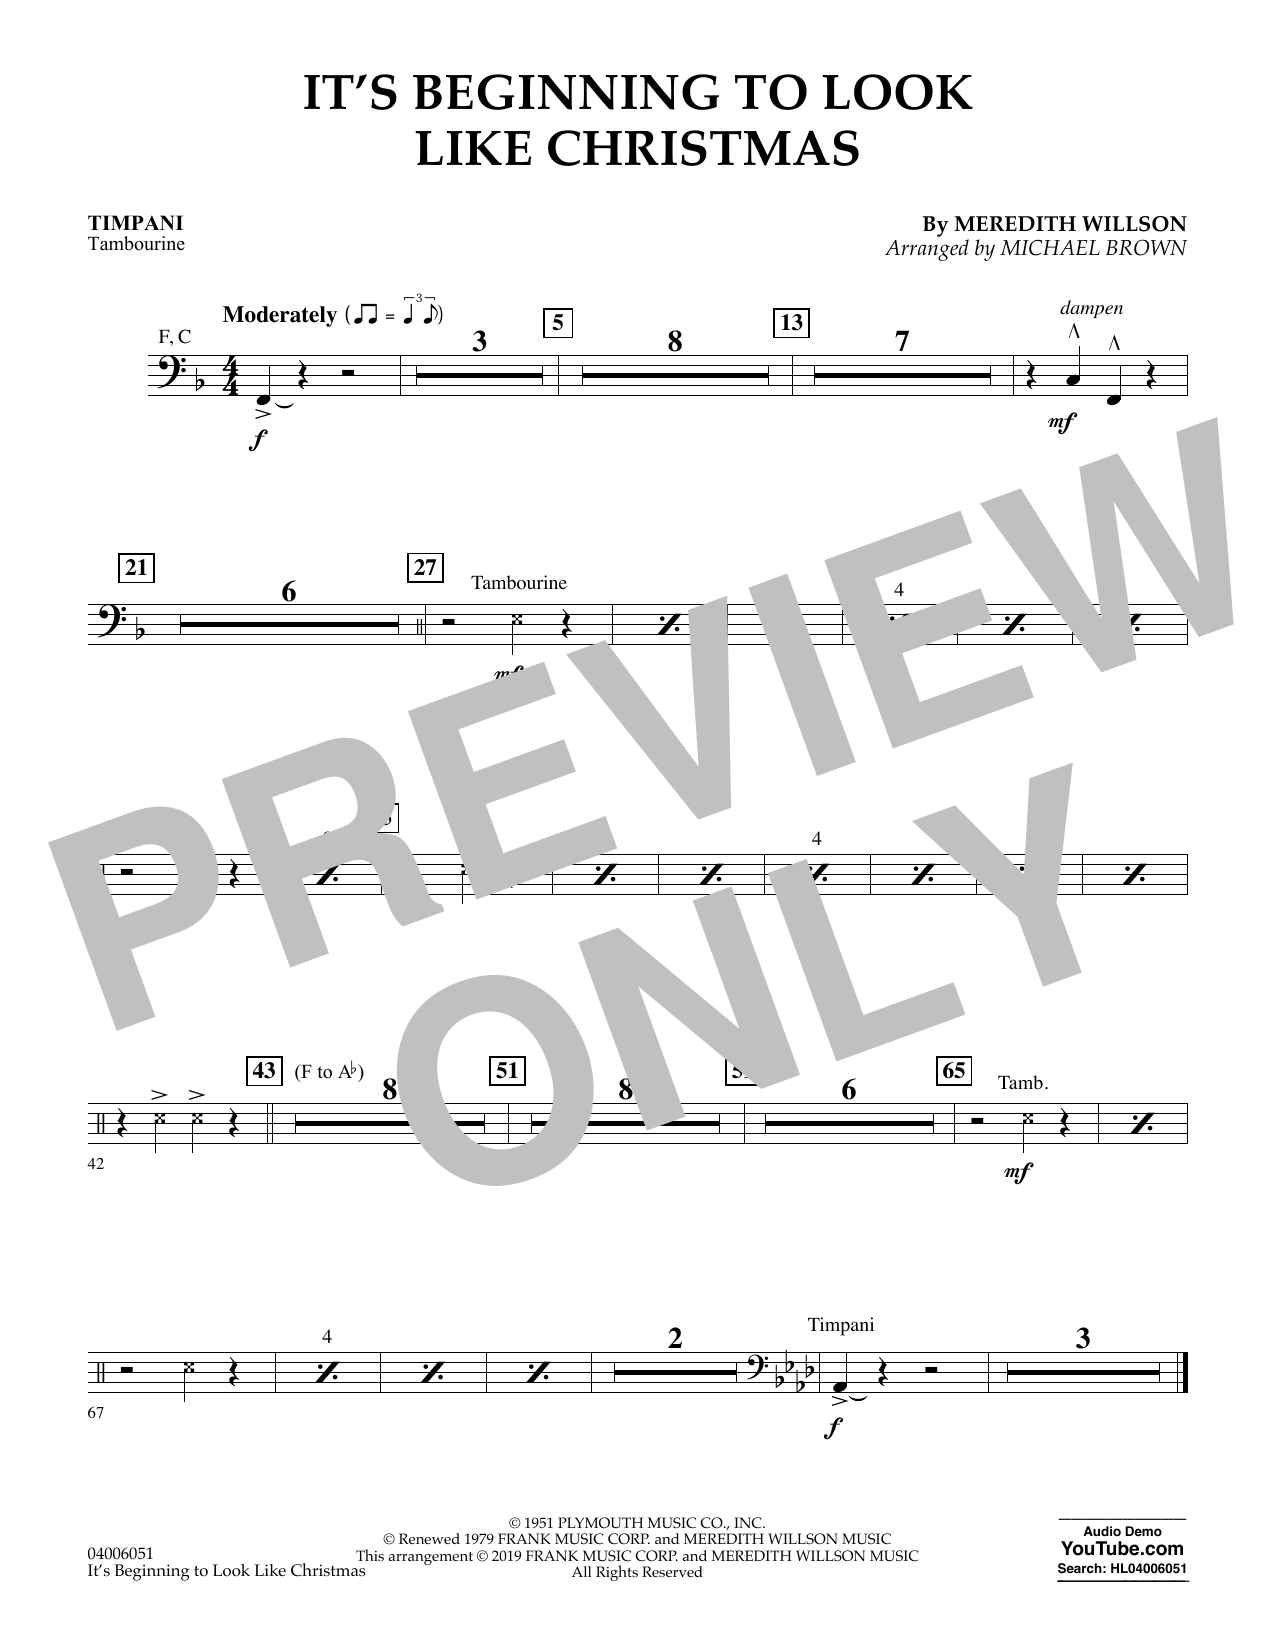 It's Beginning to Look Like Christmas (arr. Michael Brown) - Timpani (Flex-Band)